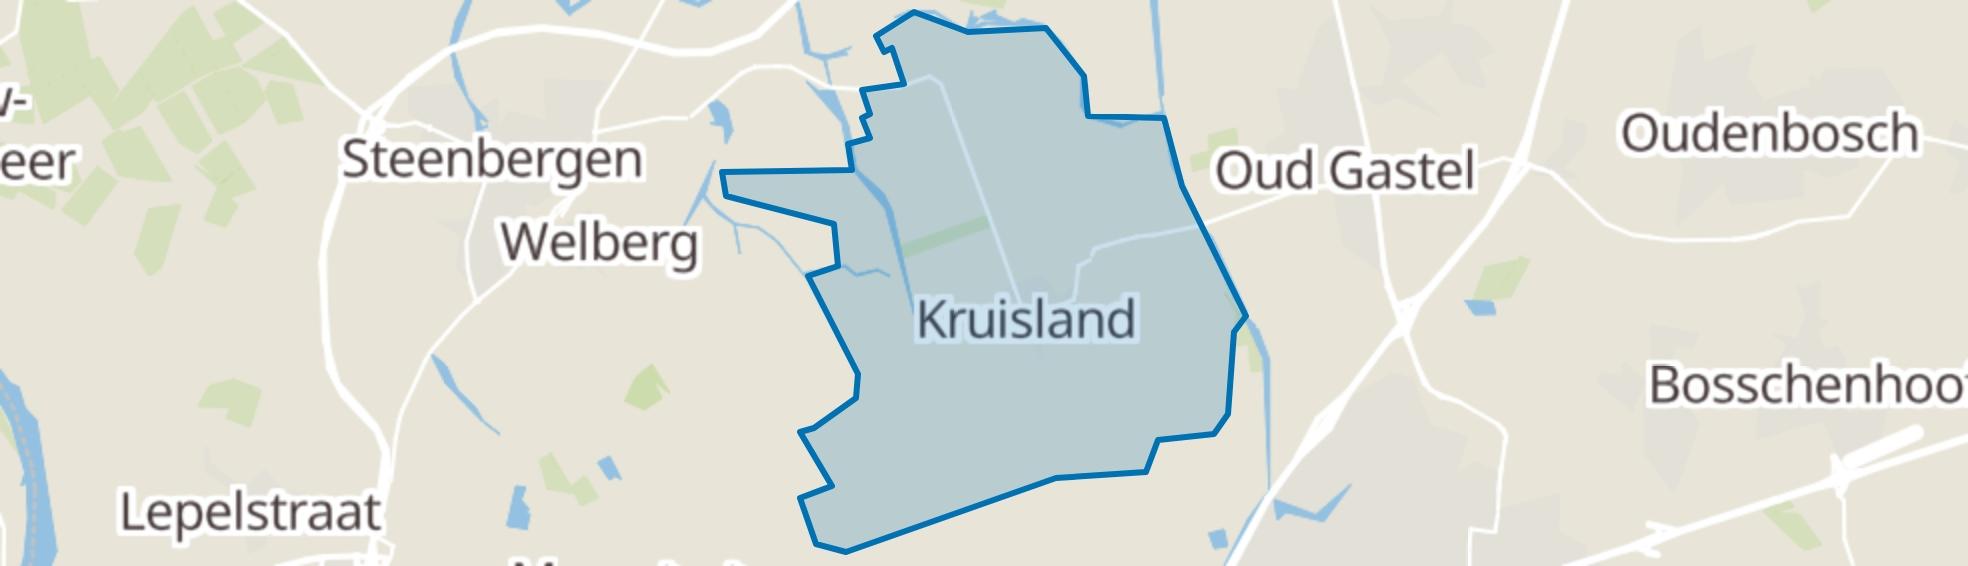 Kruisland map